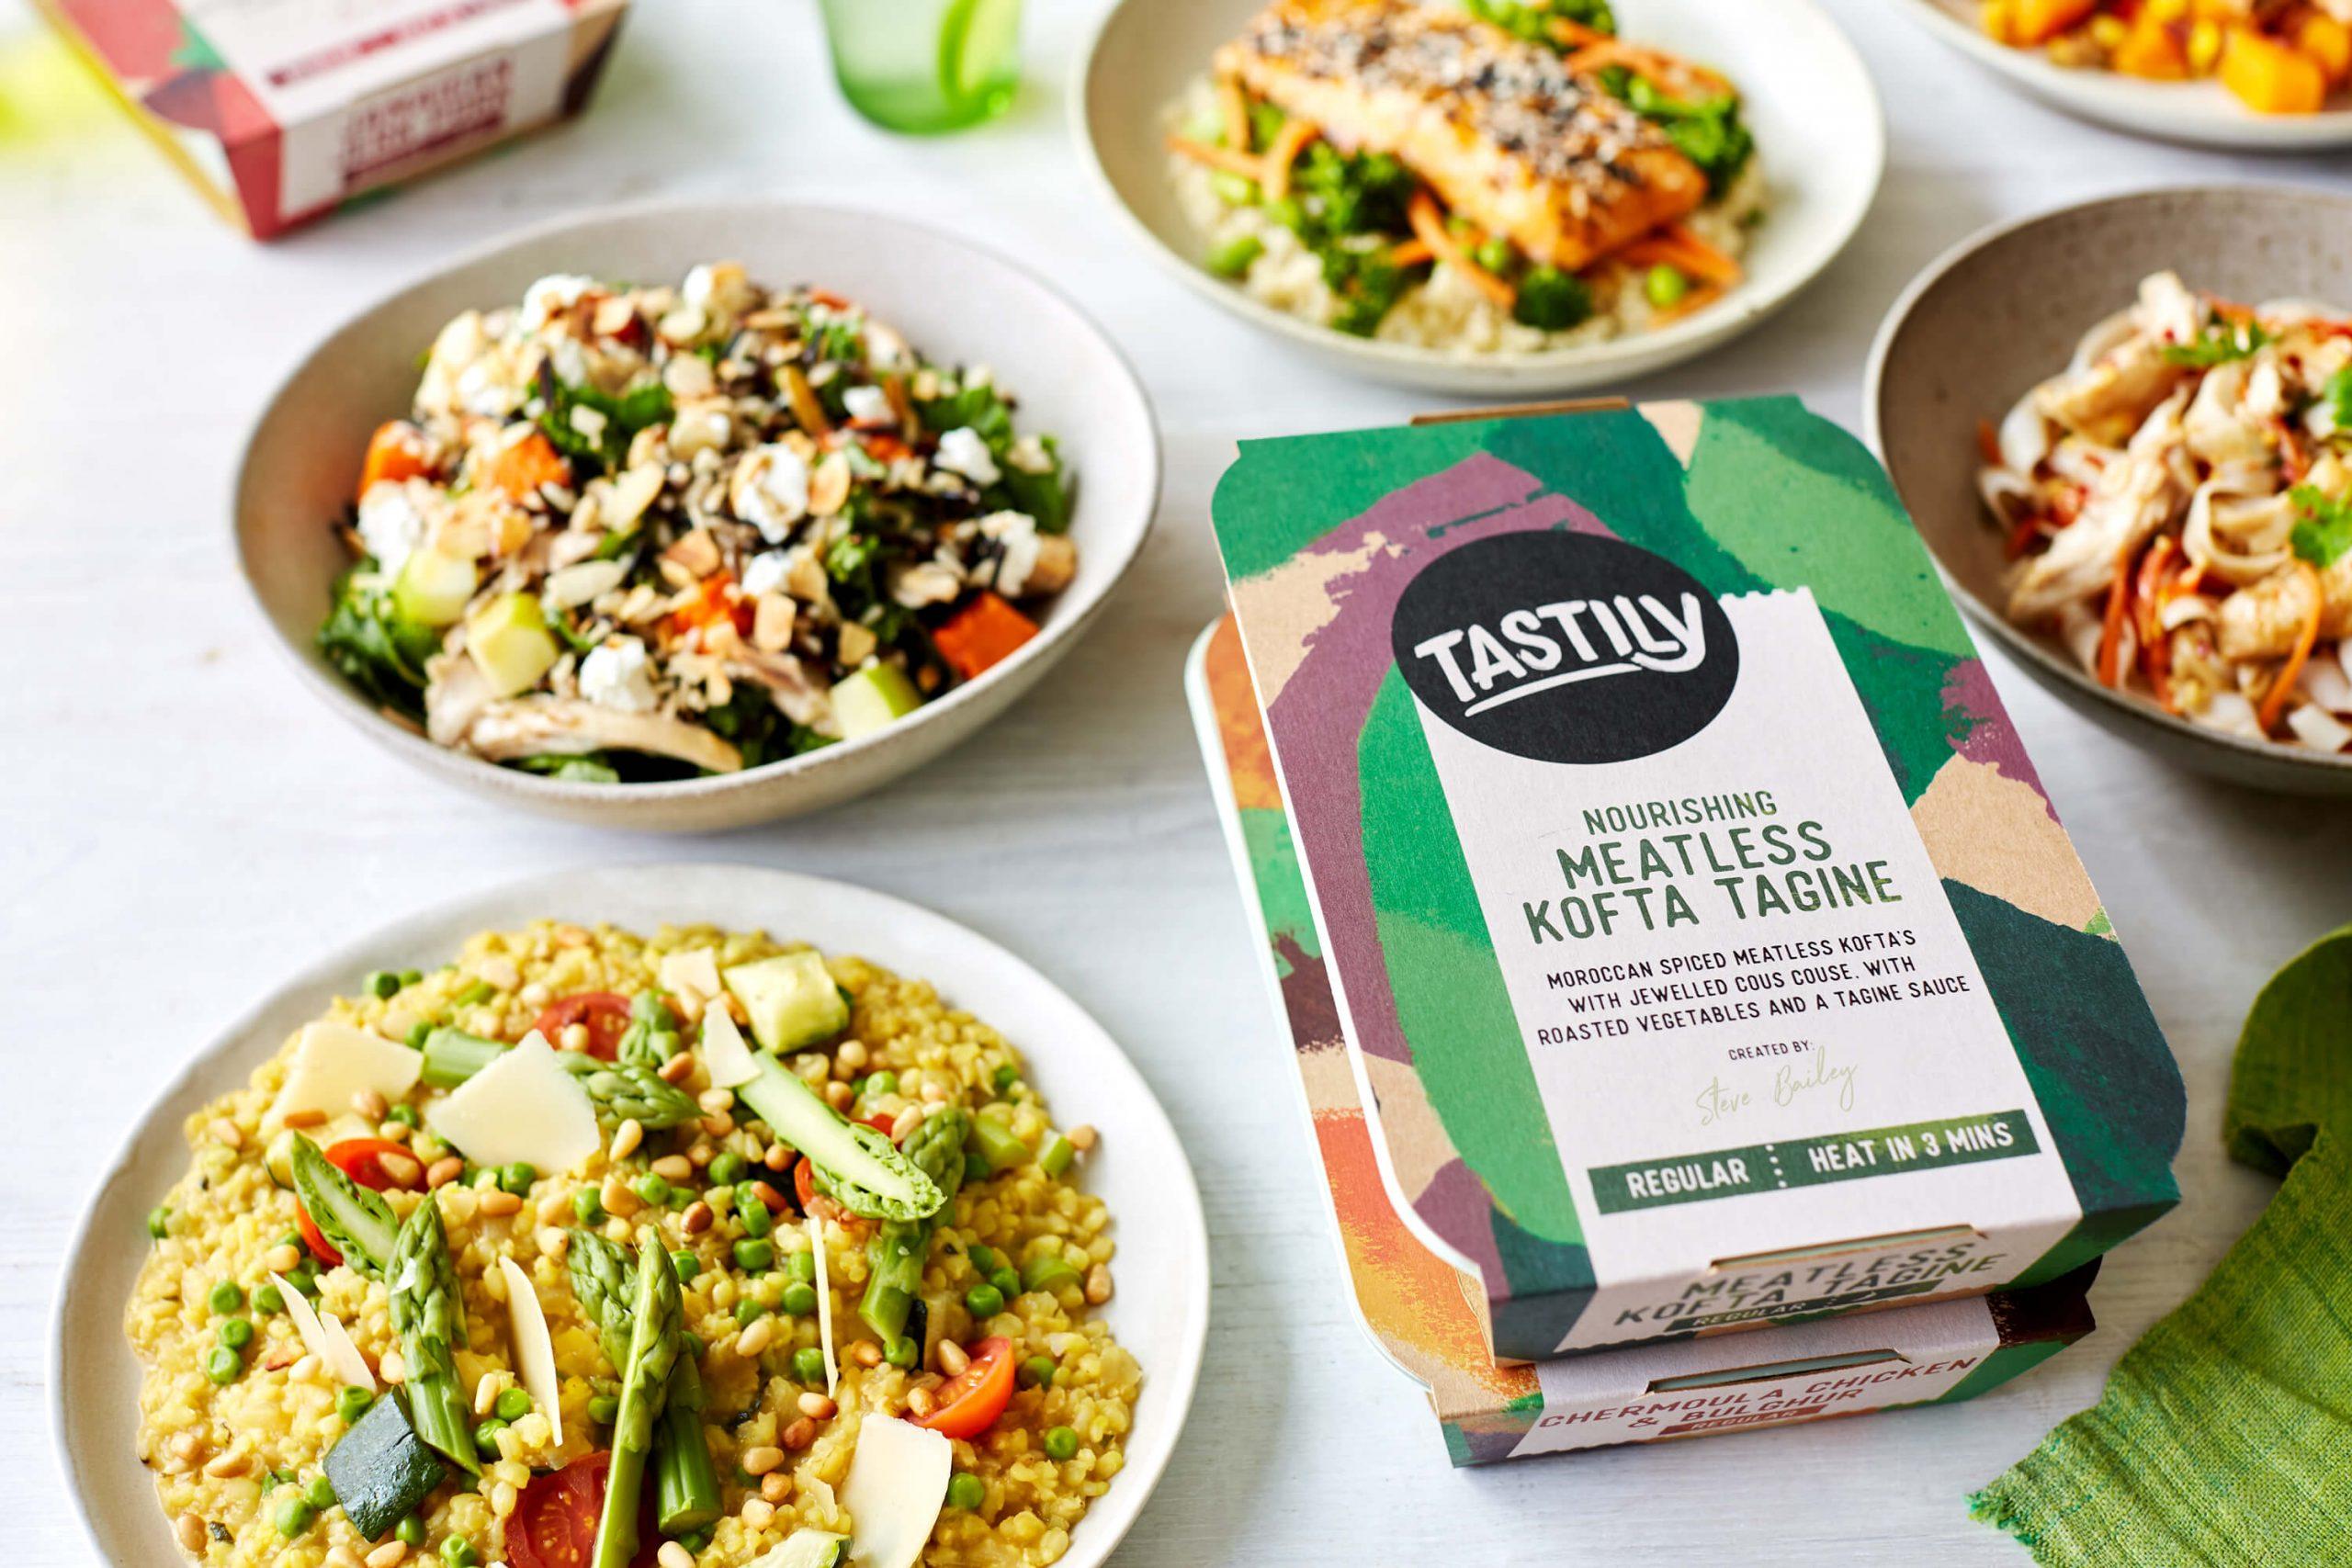 Tastily Prepared Meals Delivered To Your Door Review